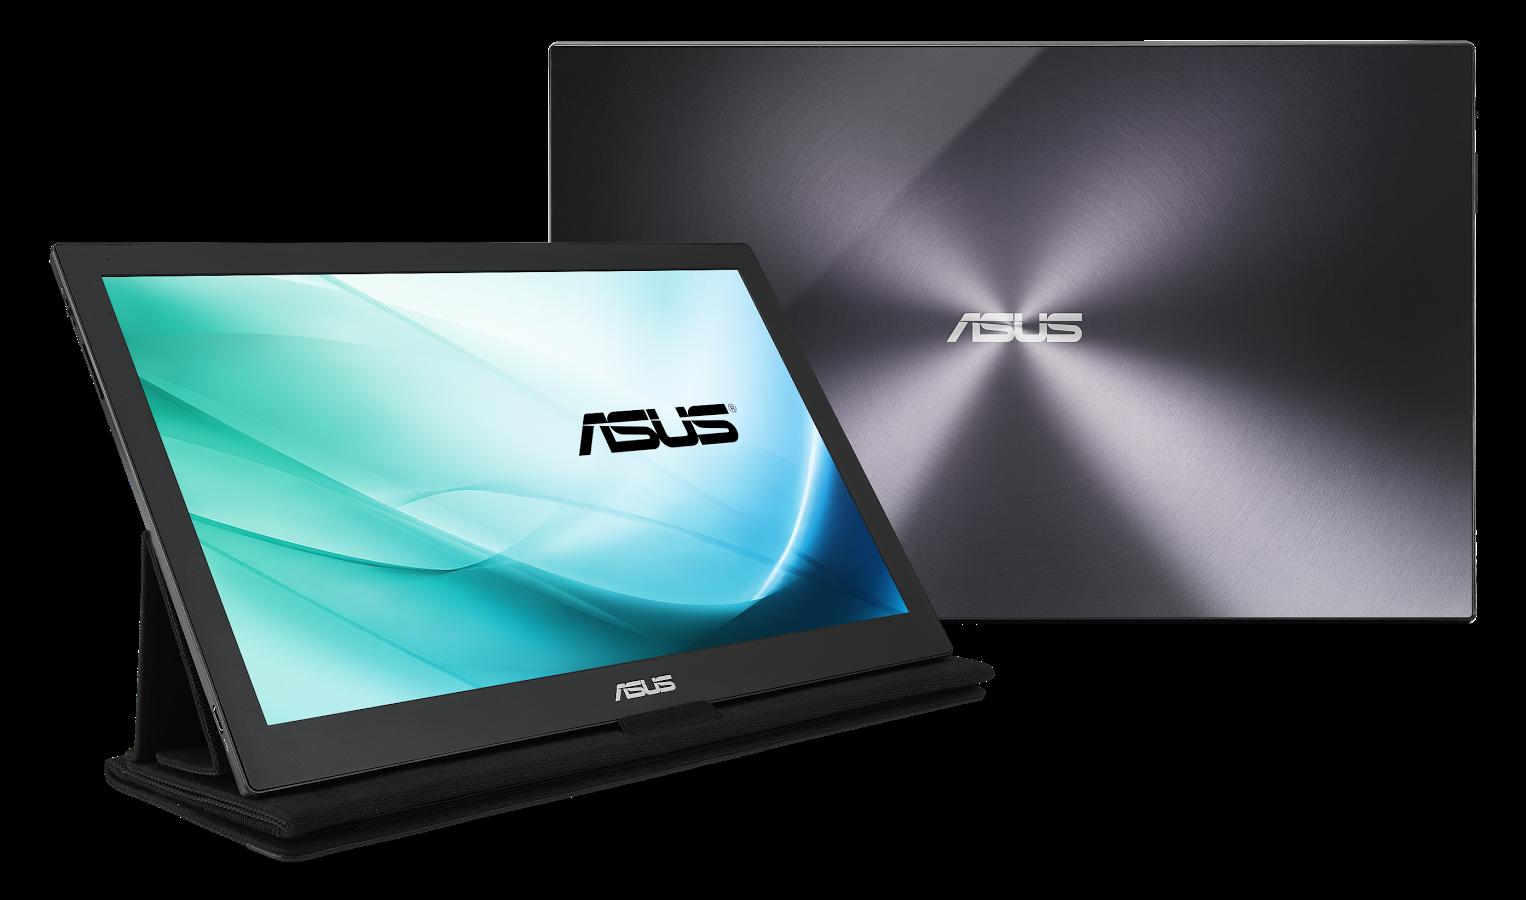 CES 2016: ASUS Announces MB169C+ USB Type-C Monitor